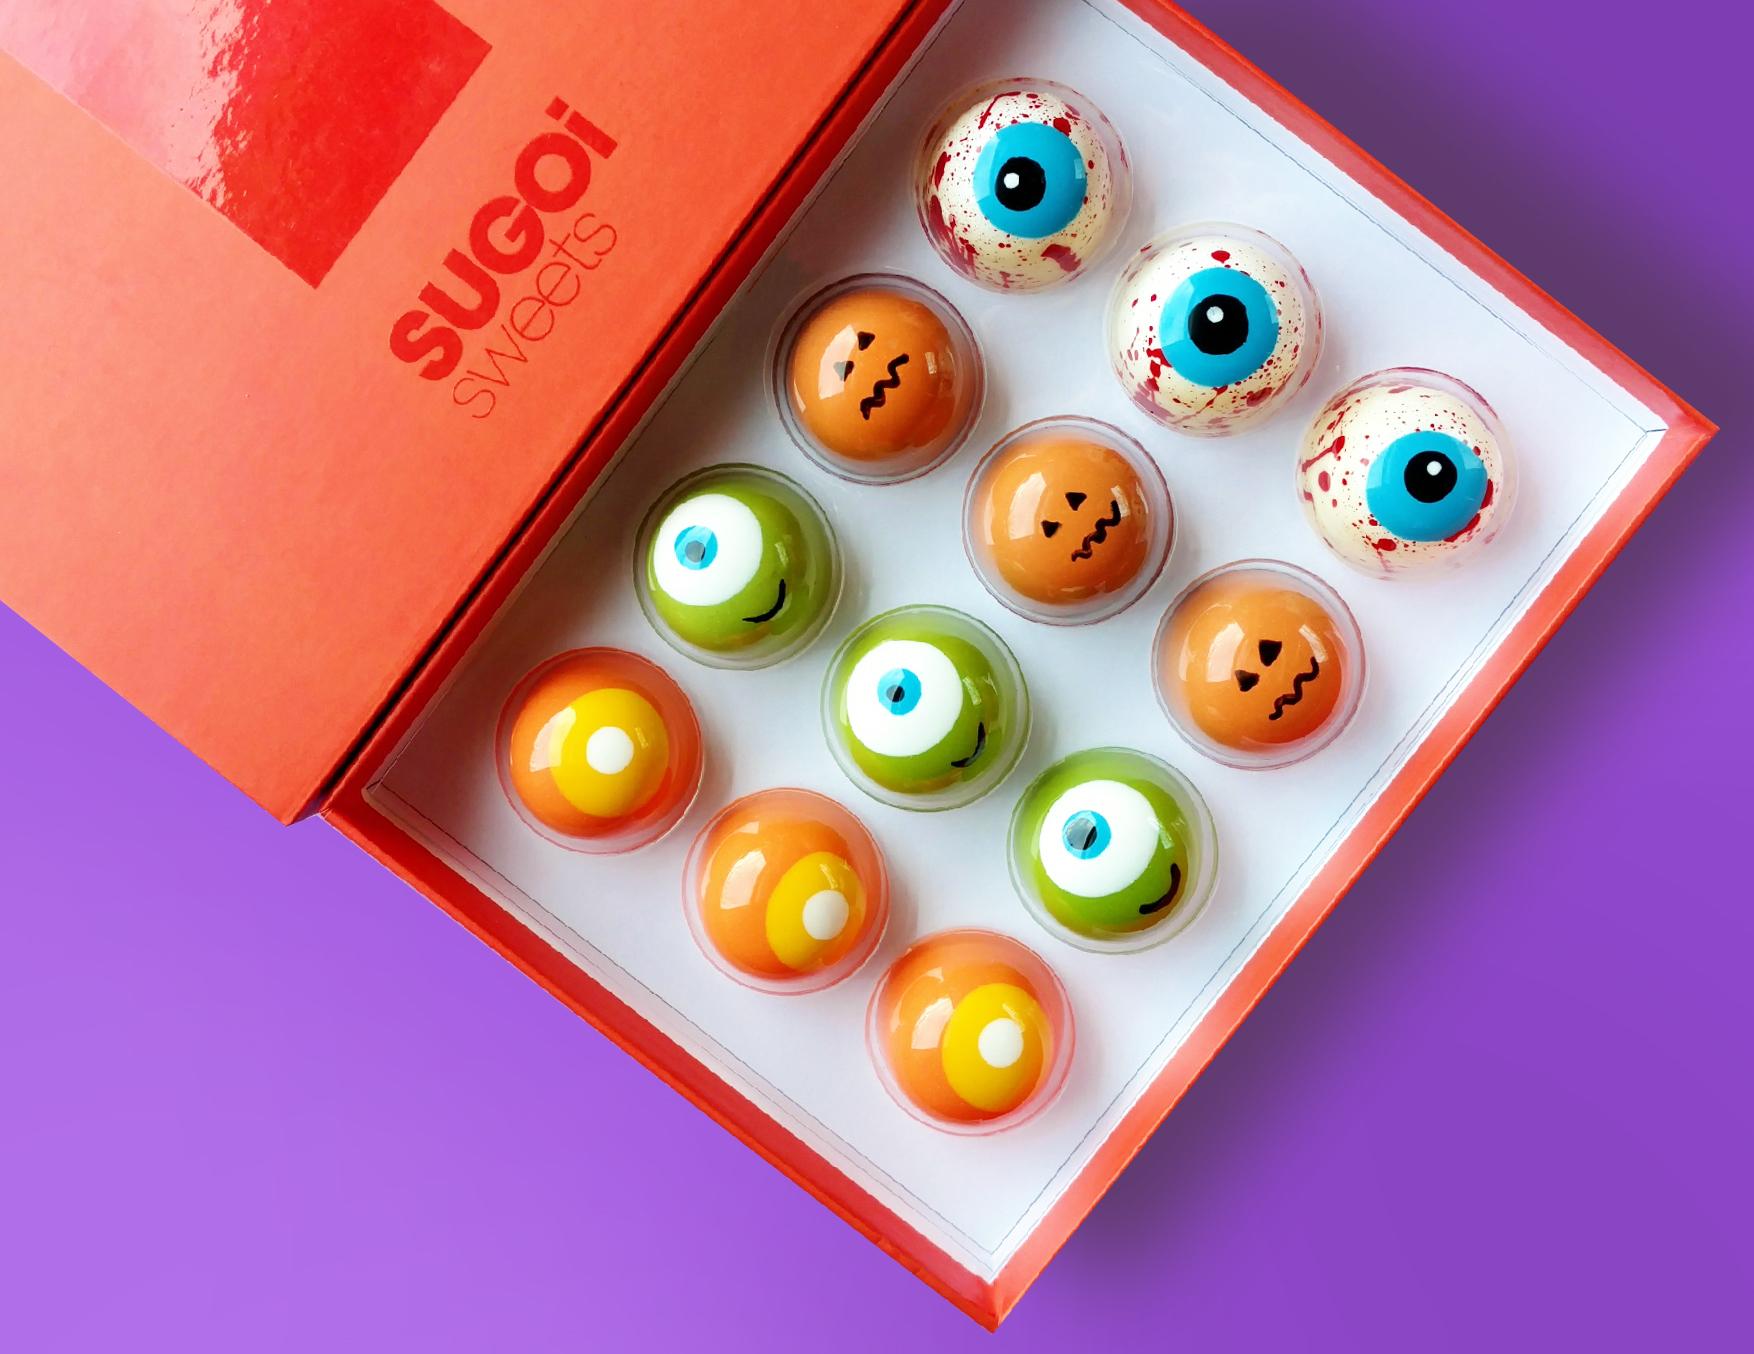 A box of bonbons.